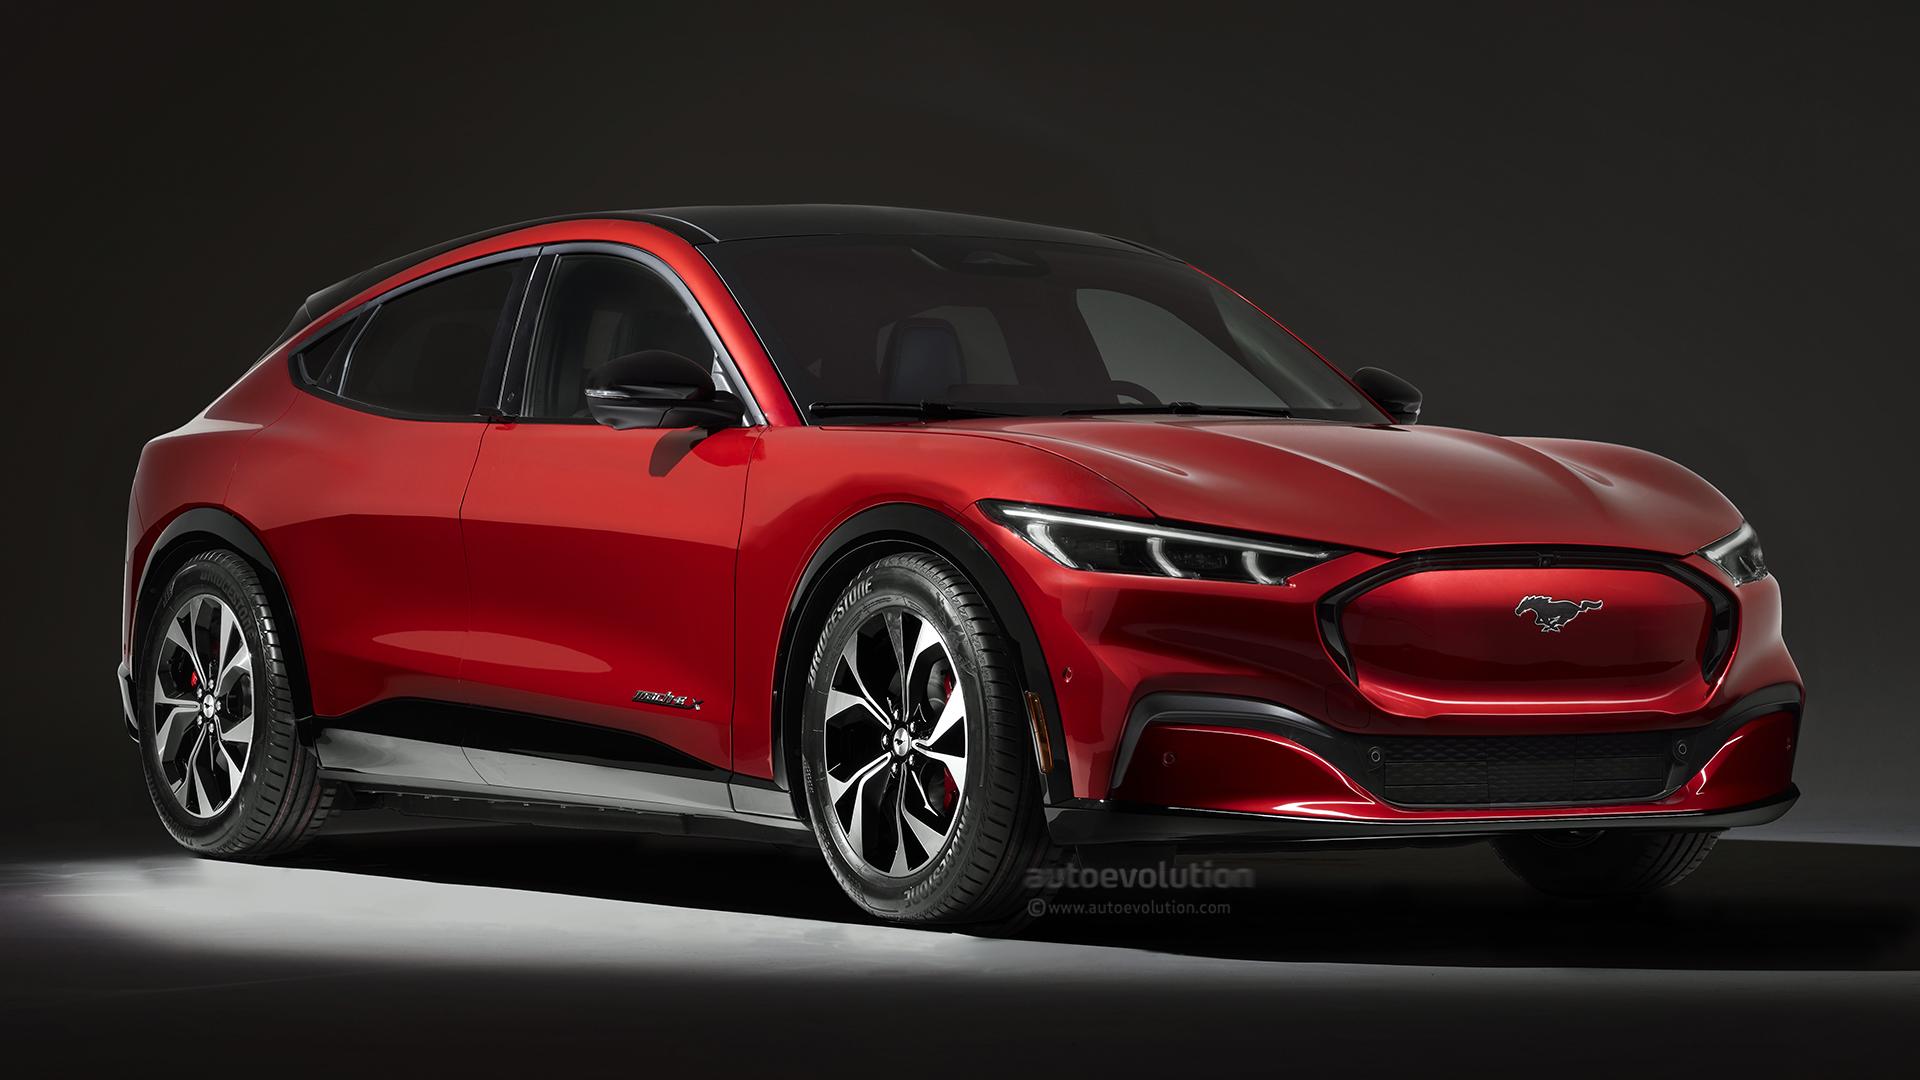 Ford Mustang Mach-E Hatchback Is the Blue Oval EV We Should Have Got - autoevolution